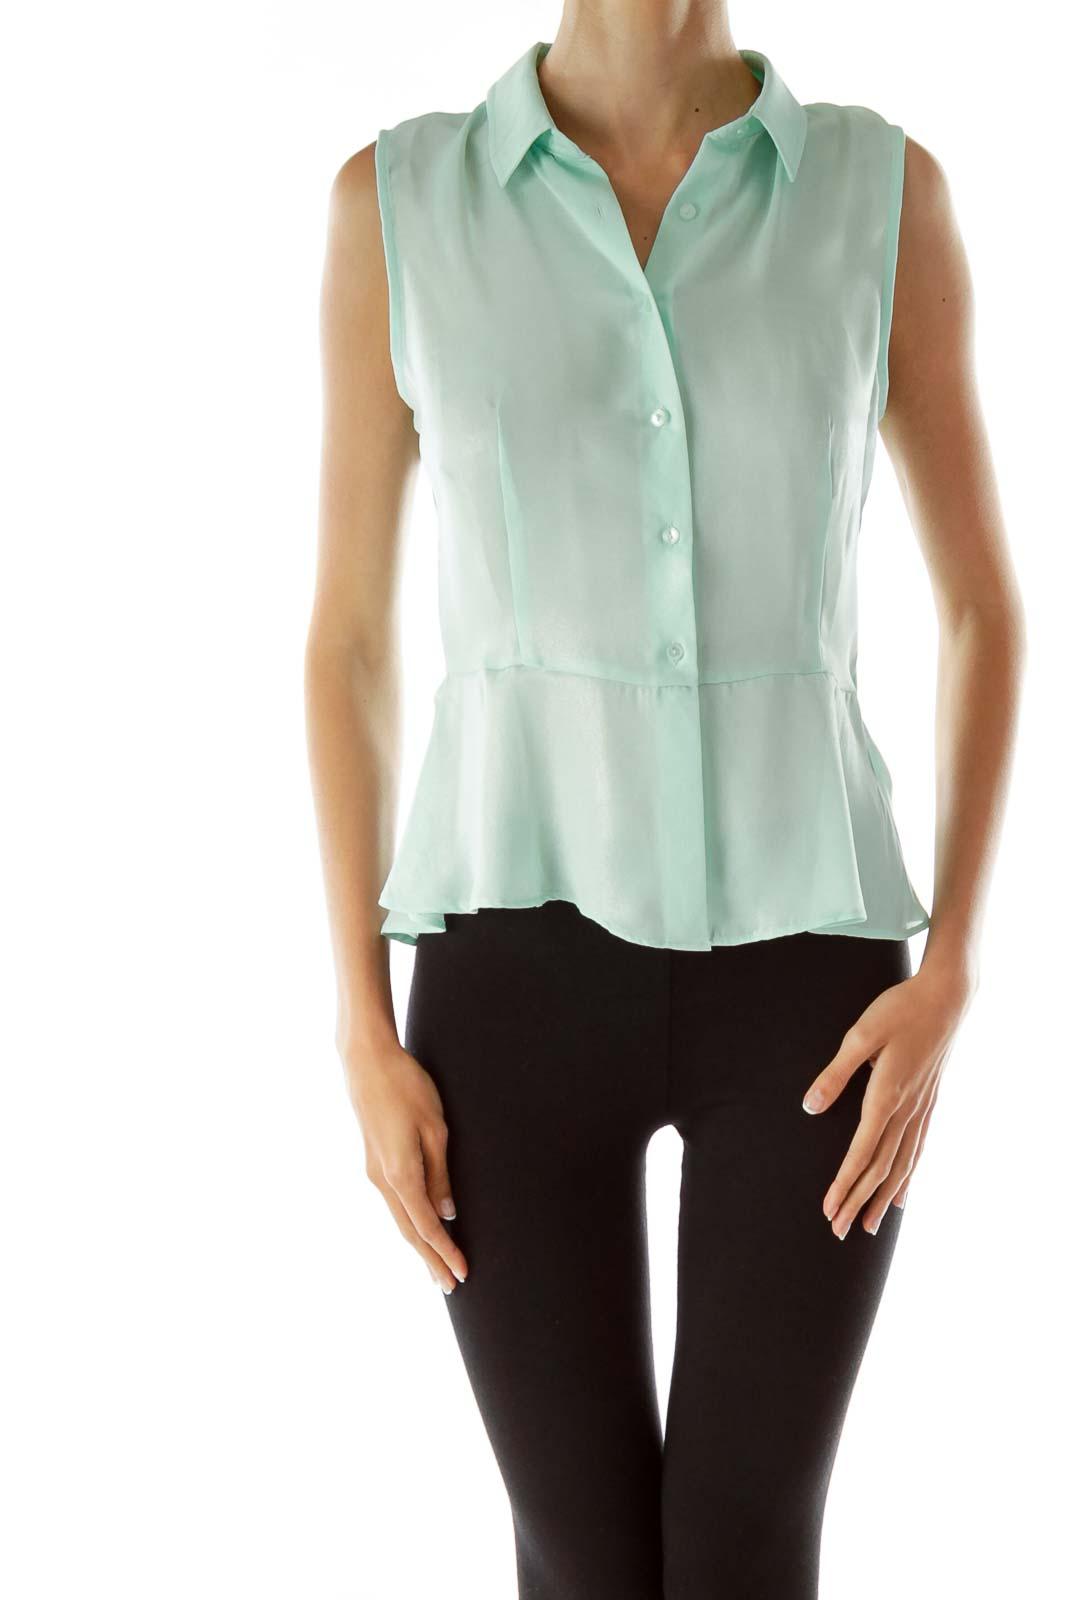 Mint Green Shimmer Sleeveless Blouse Front